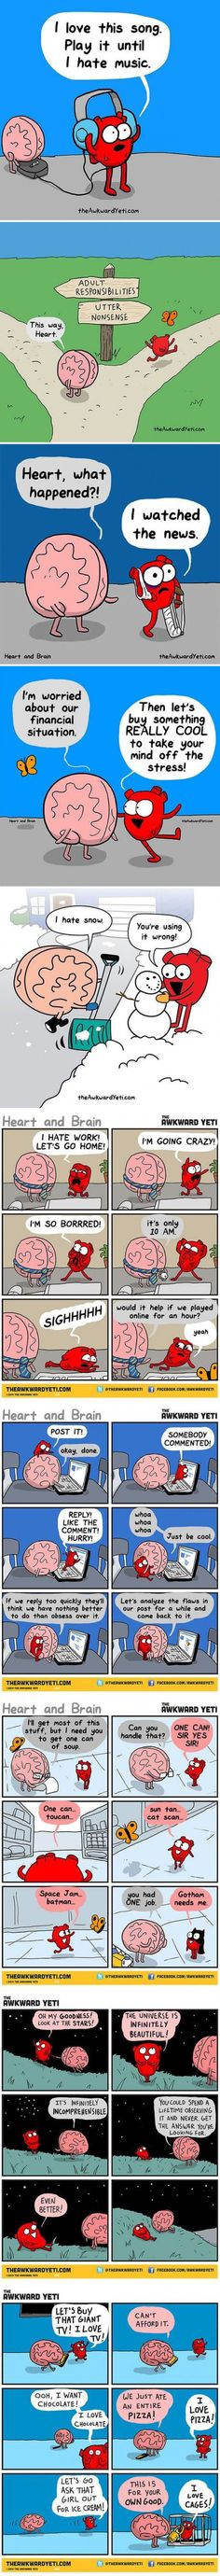 Heart and Brain - 9GAG